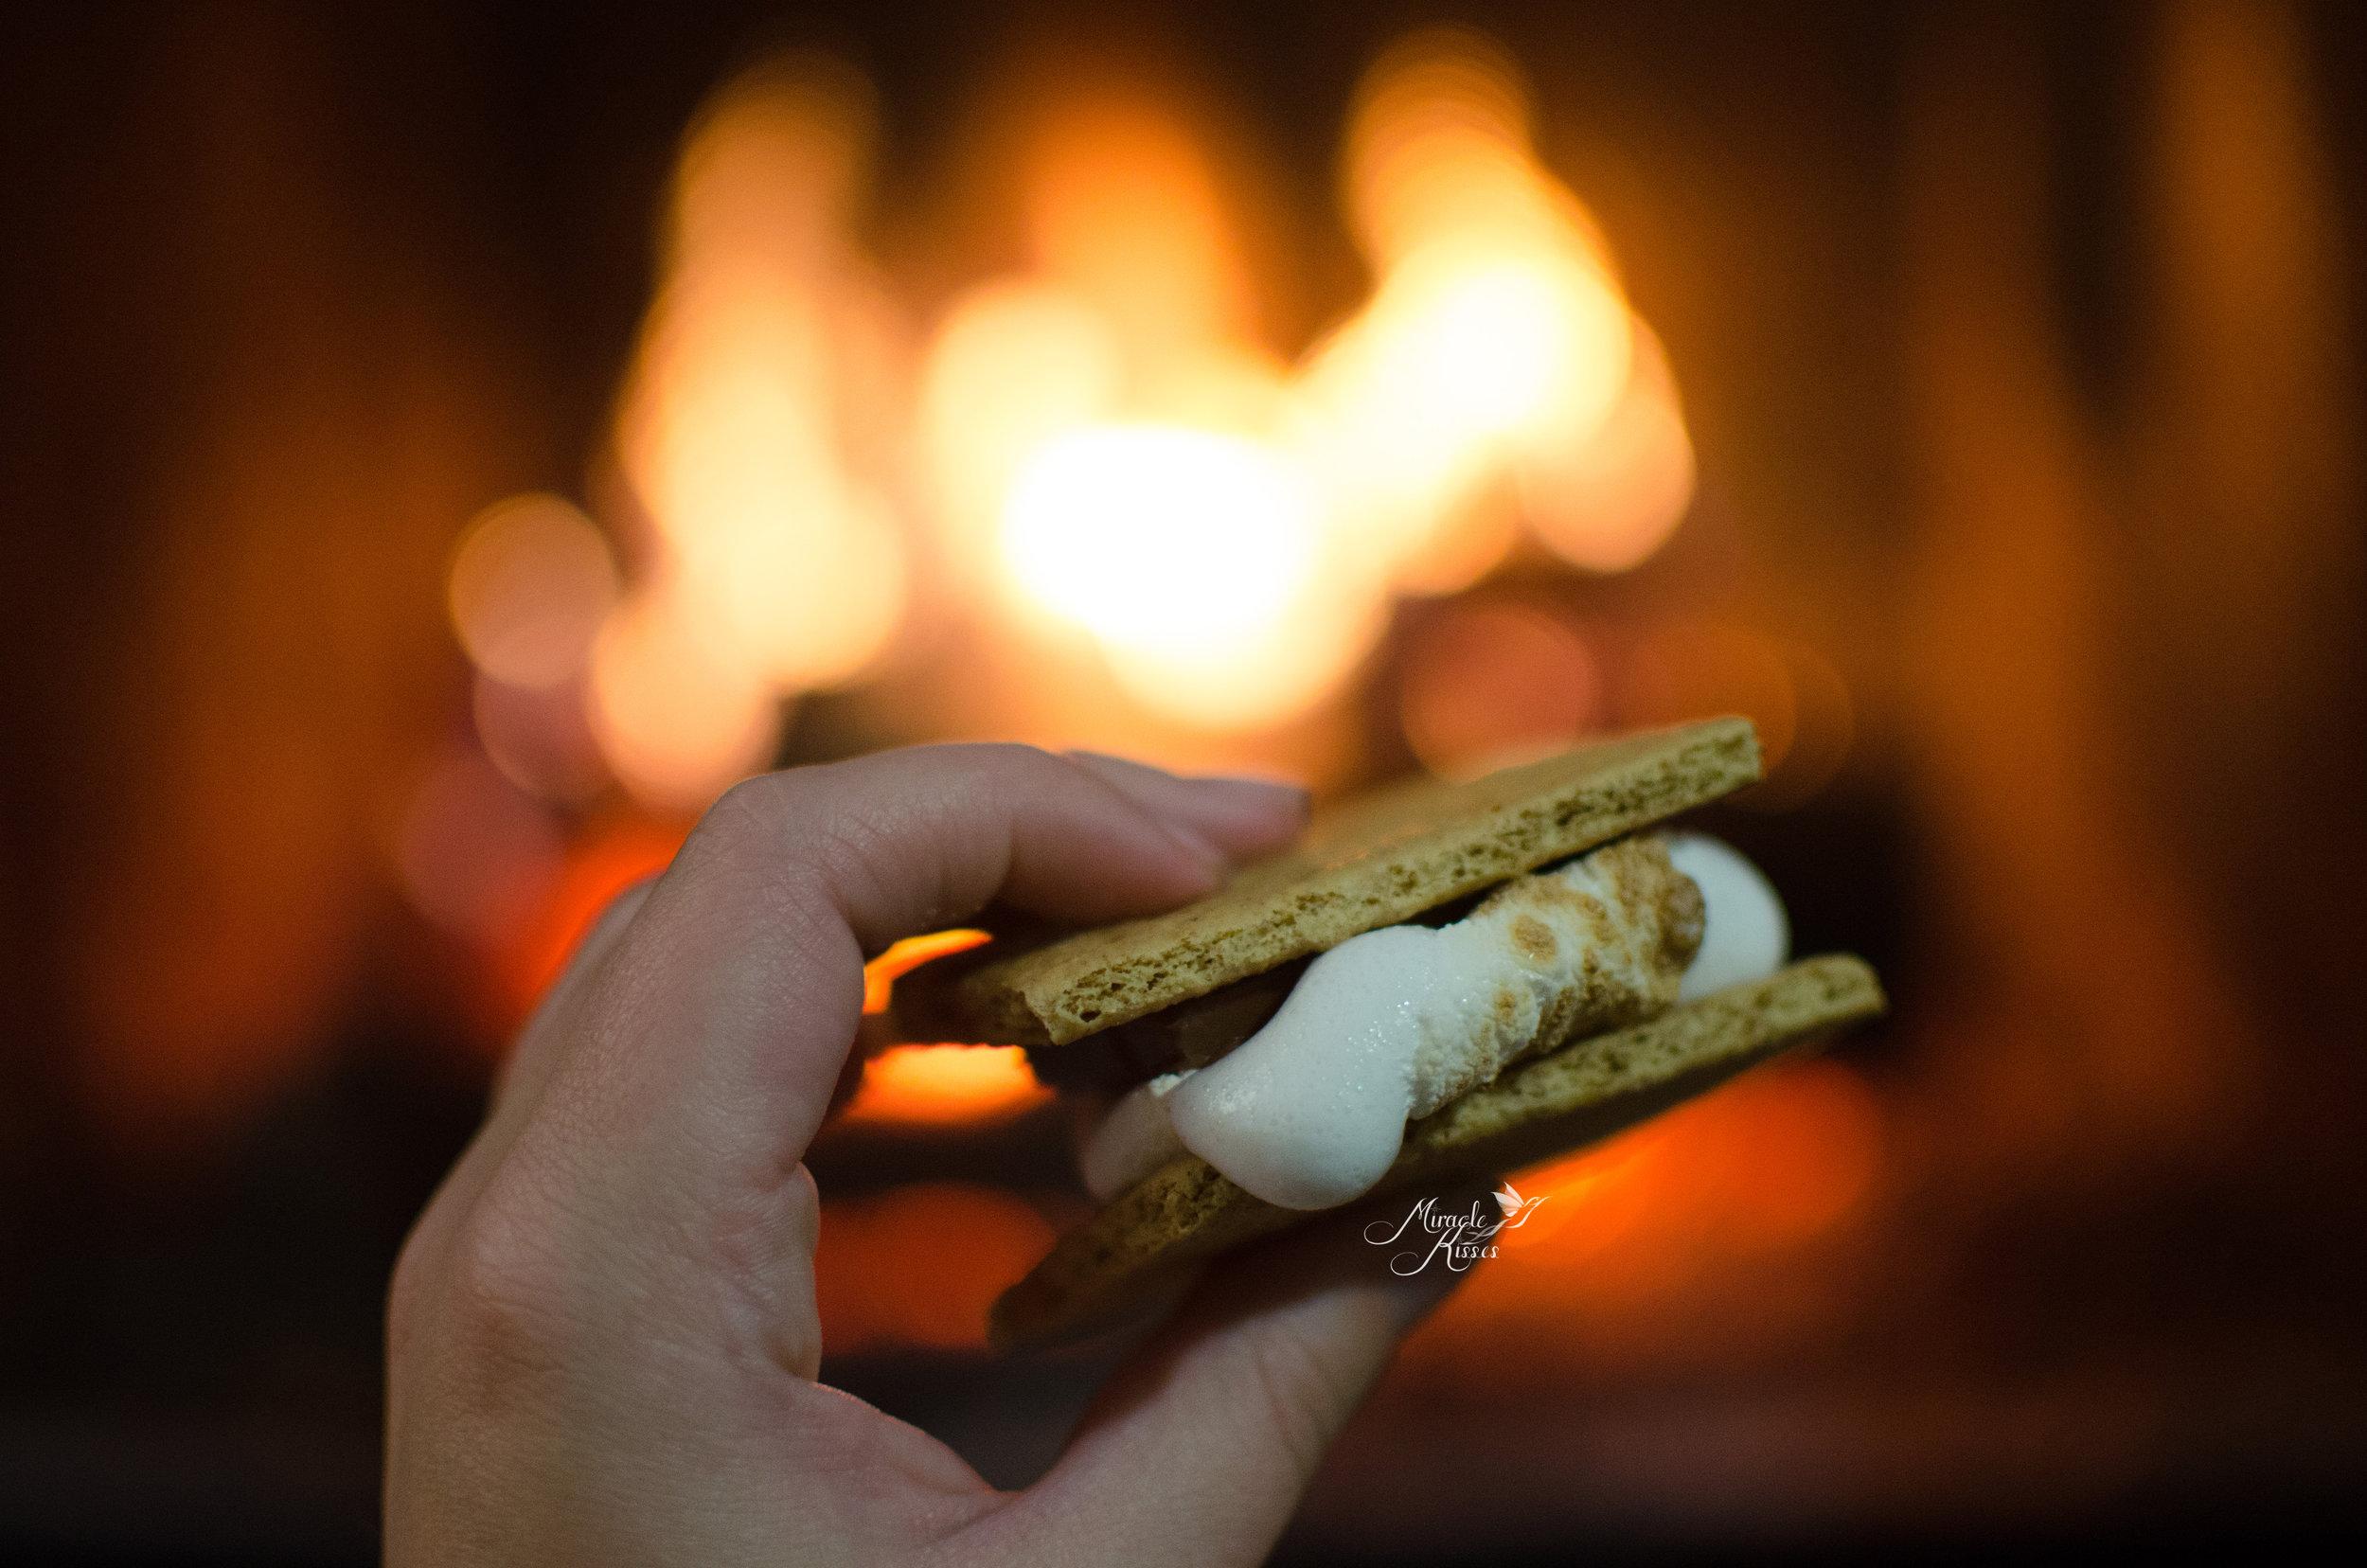 365mk2017, fluff, s'more, marshmallow, yum